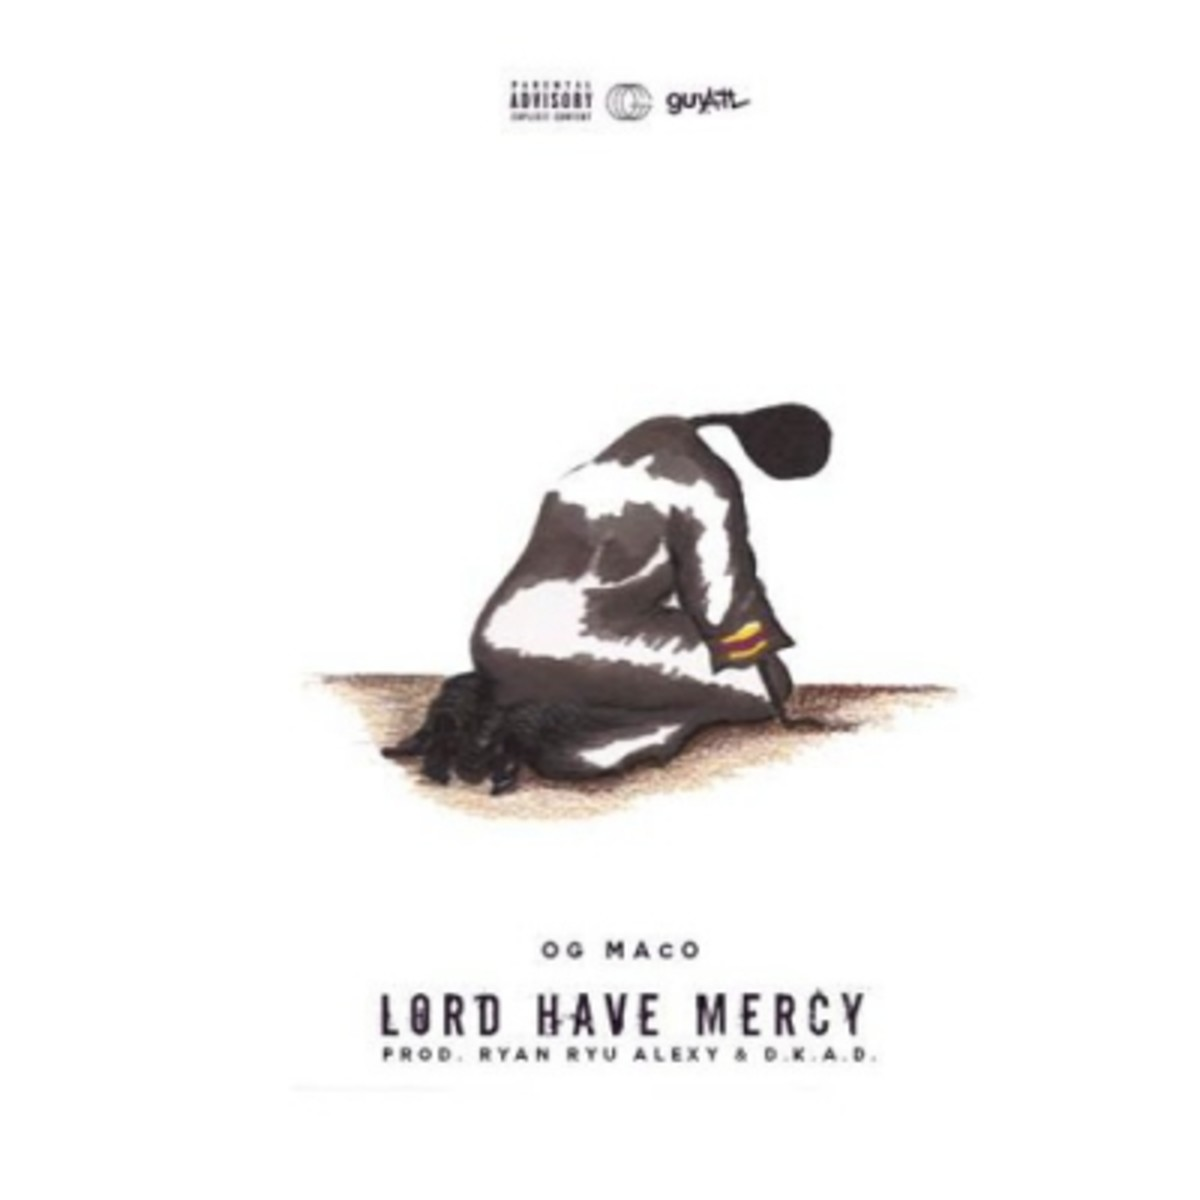 og-maco-lord-have-mercy.jpg